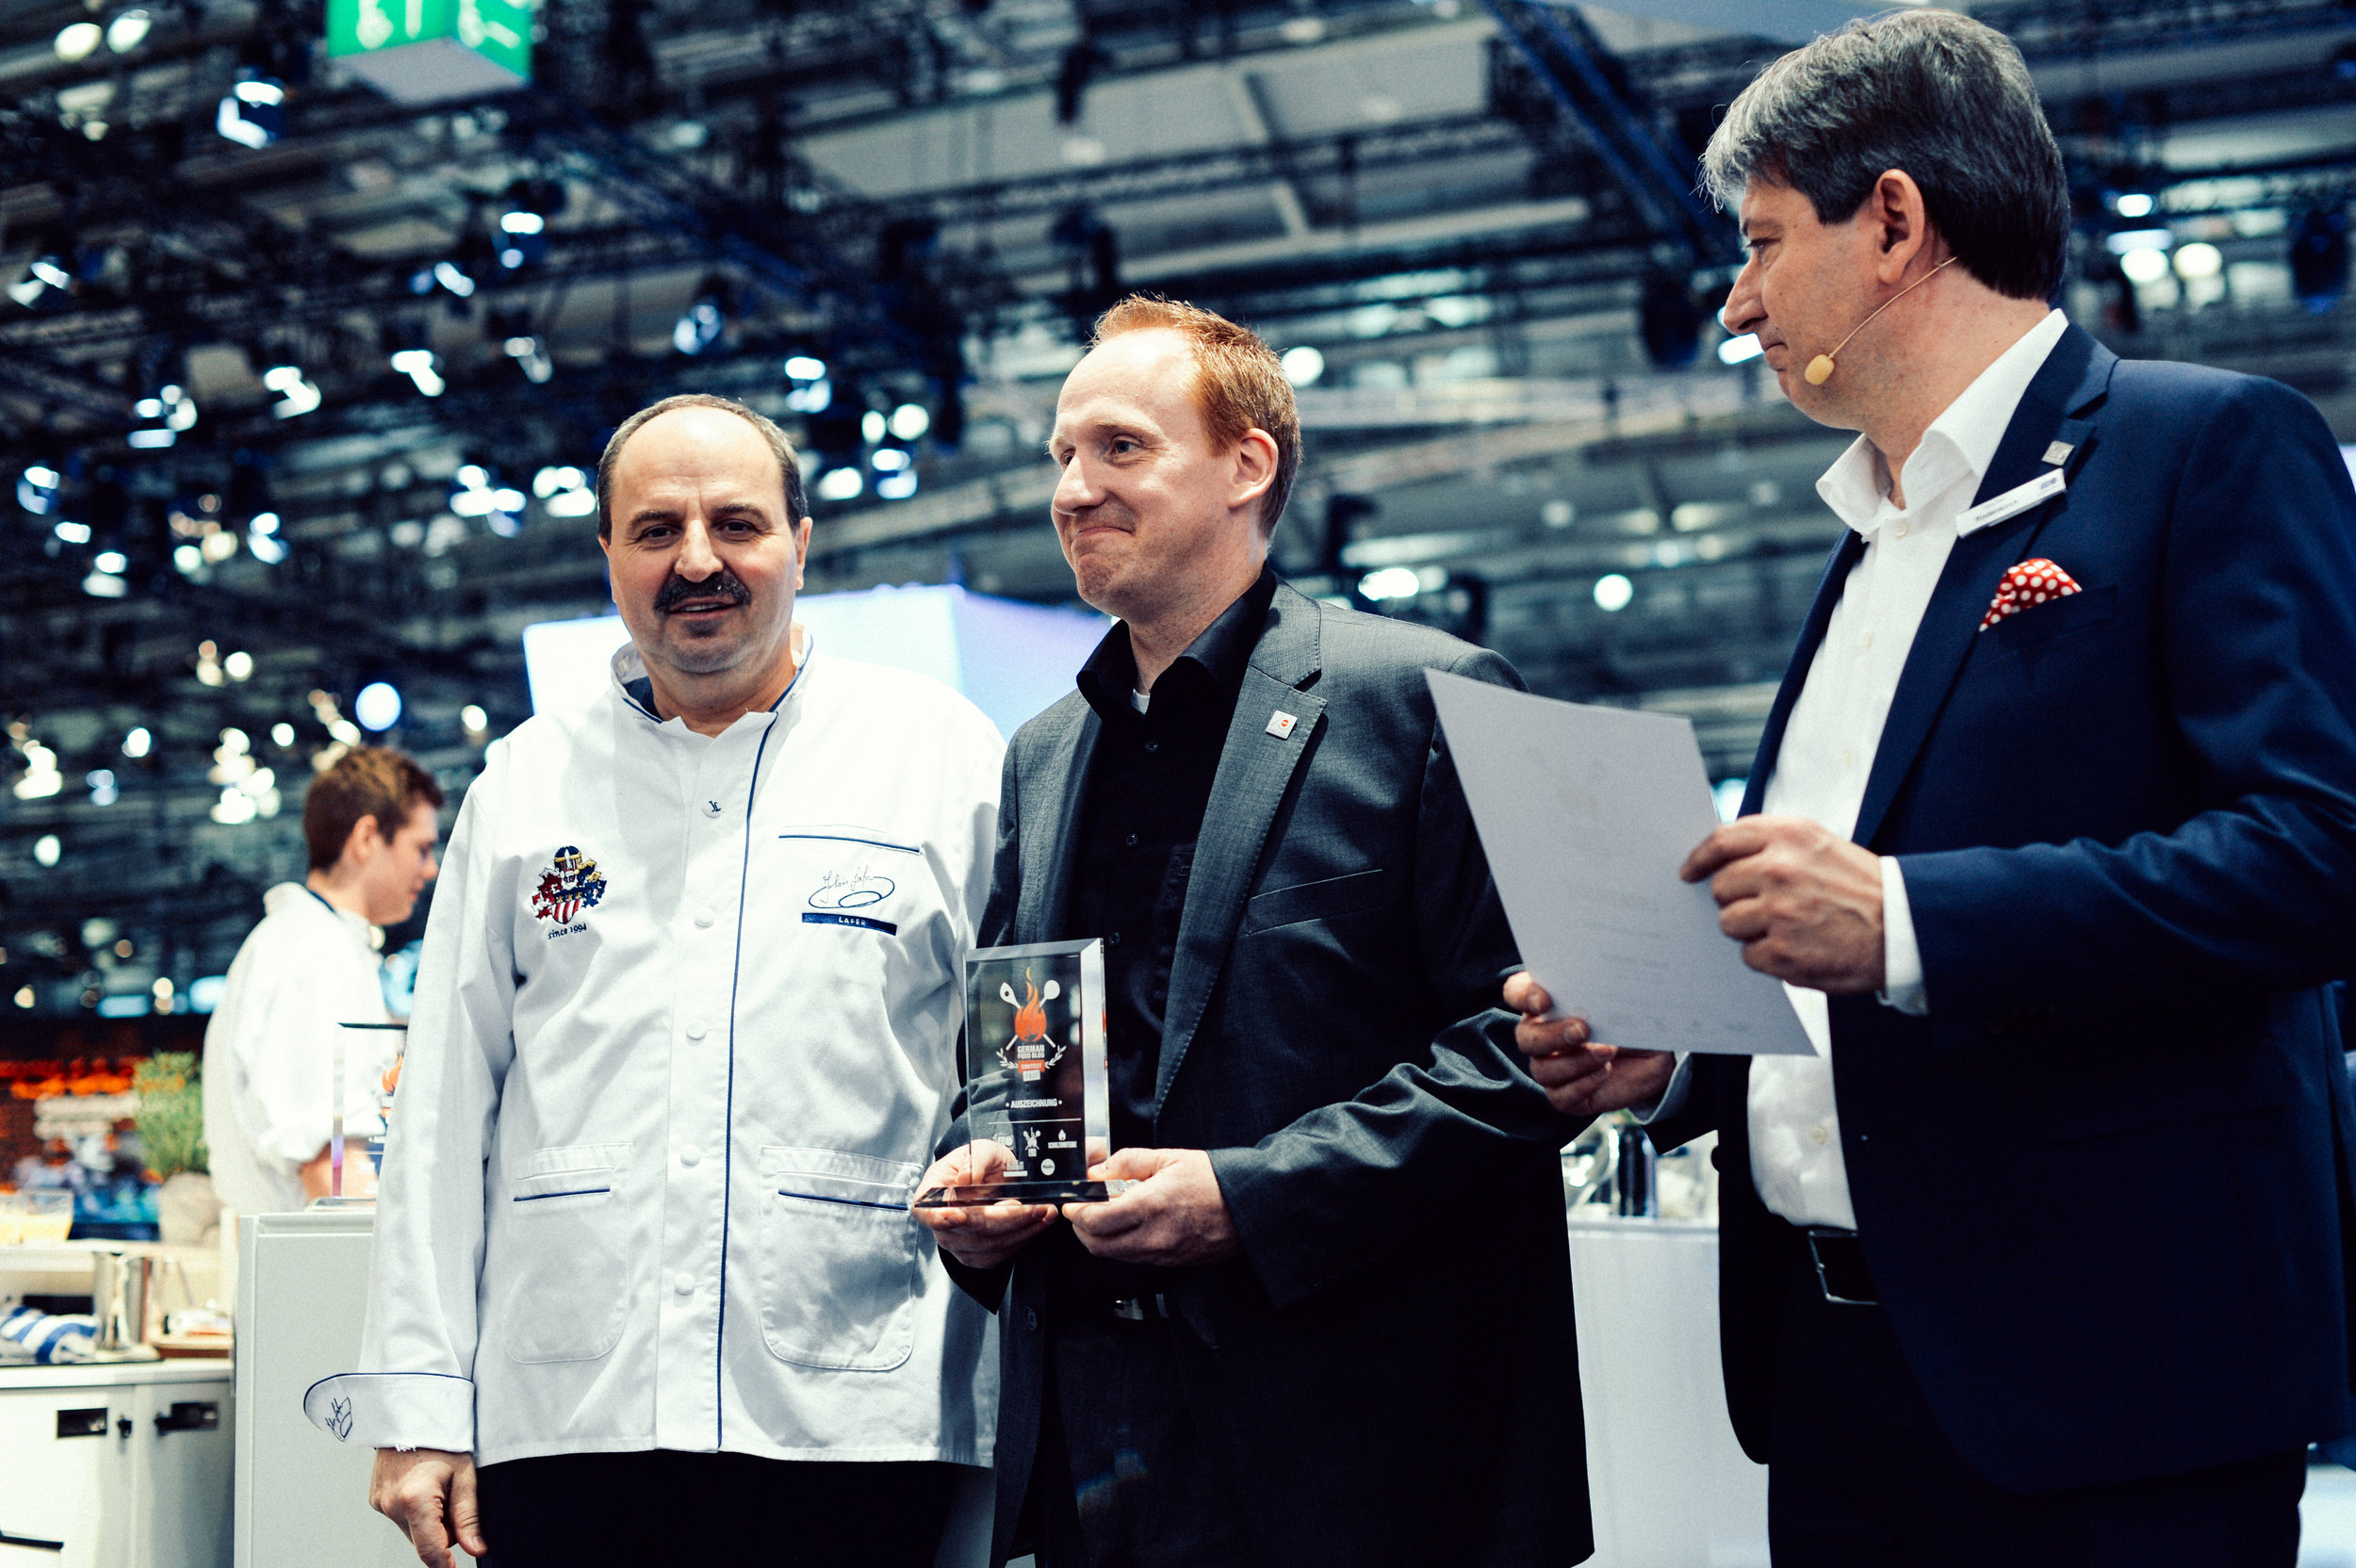 german_food_blog_contest-24.jpg